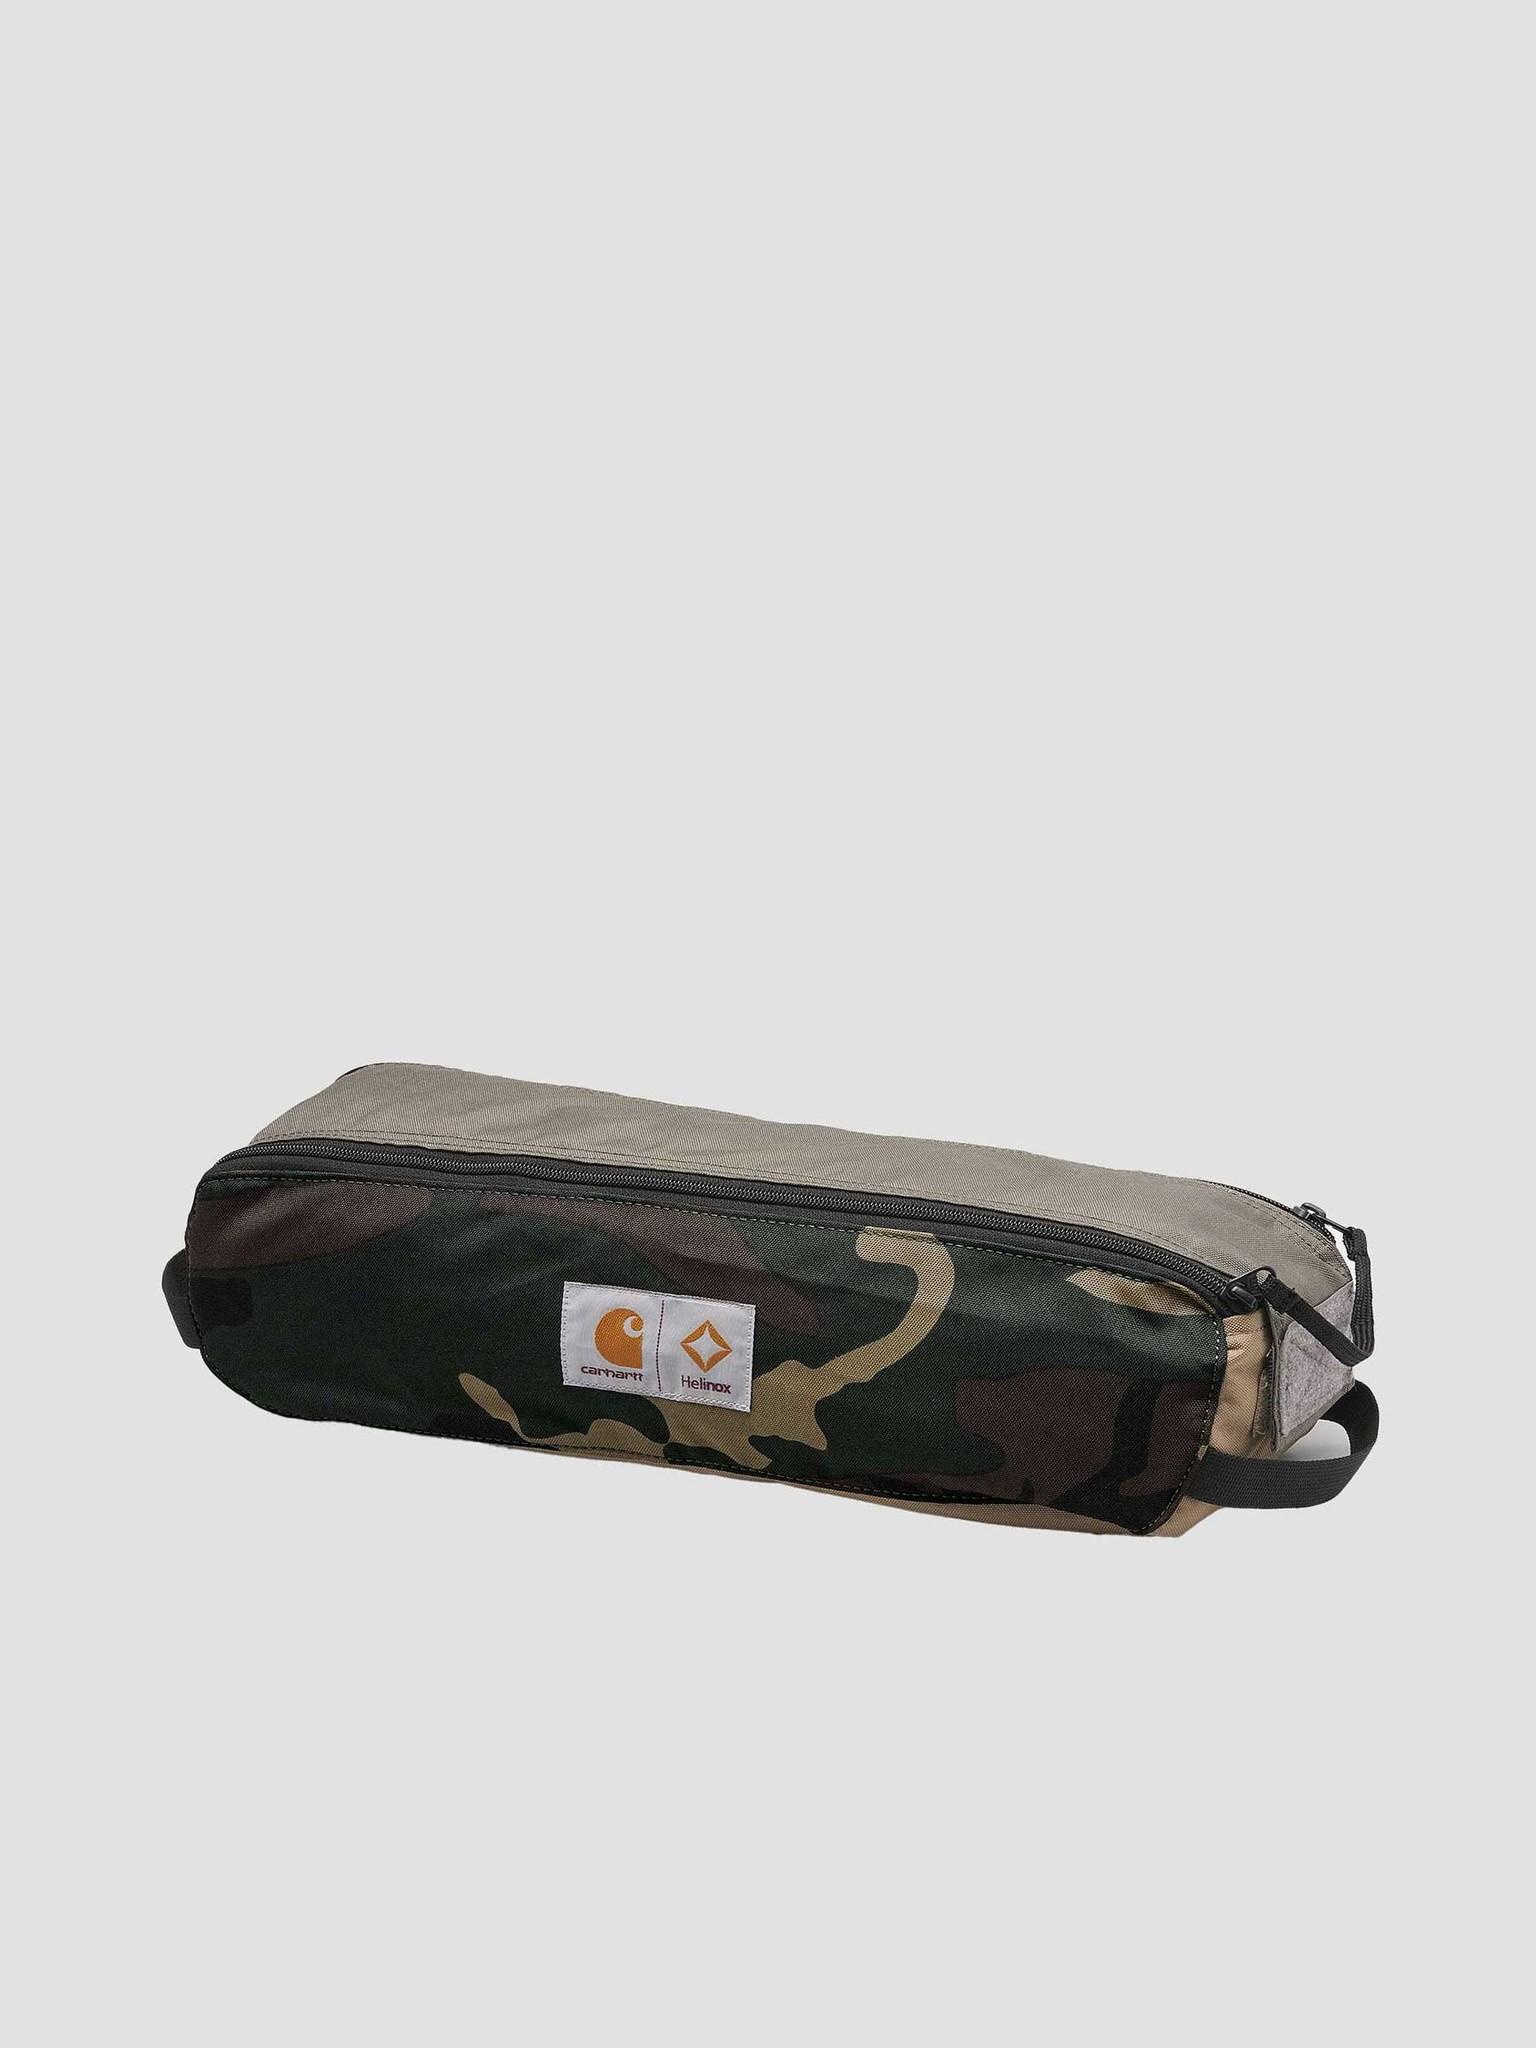 Carhartt WIP Carhartt WIP Helinox Valiant 4 Table One Black Air Force Grey Leather I029215-0DL00